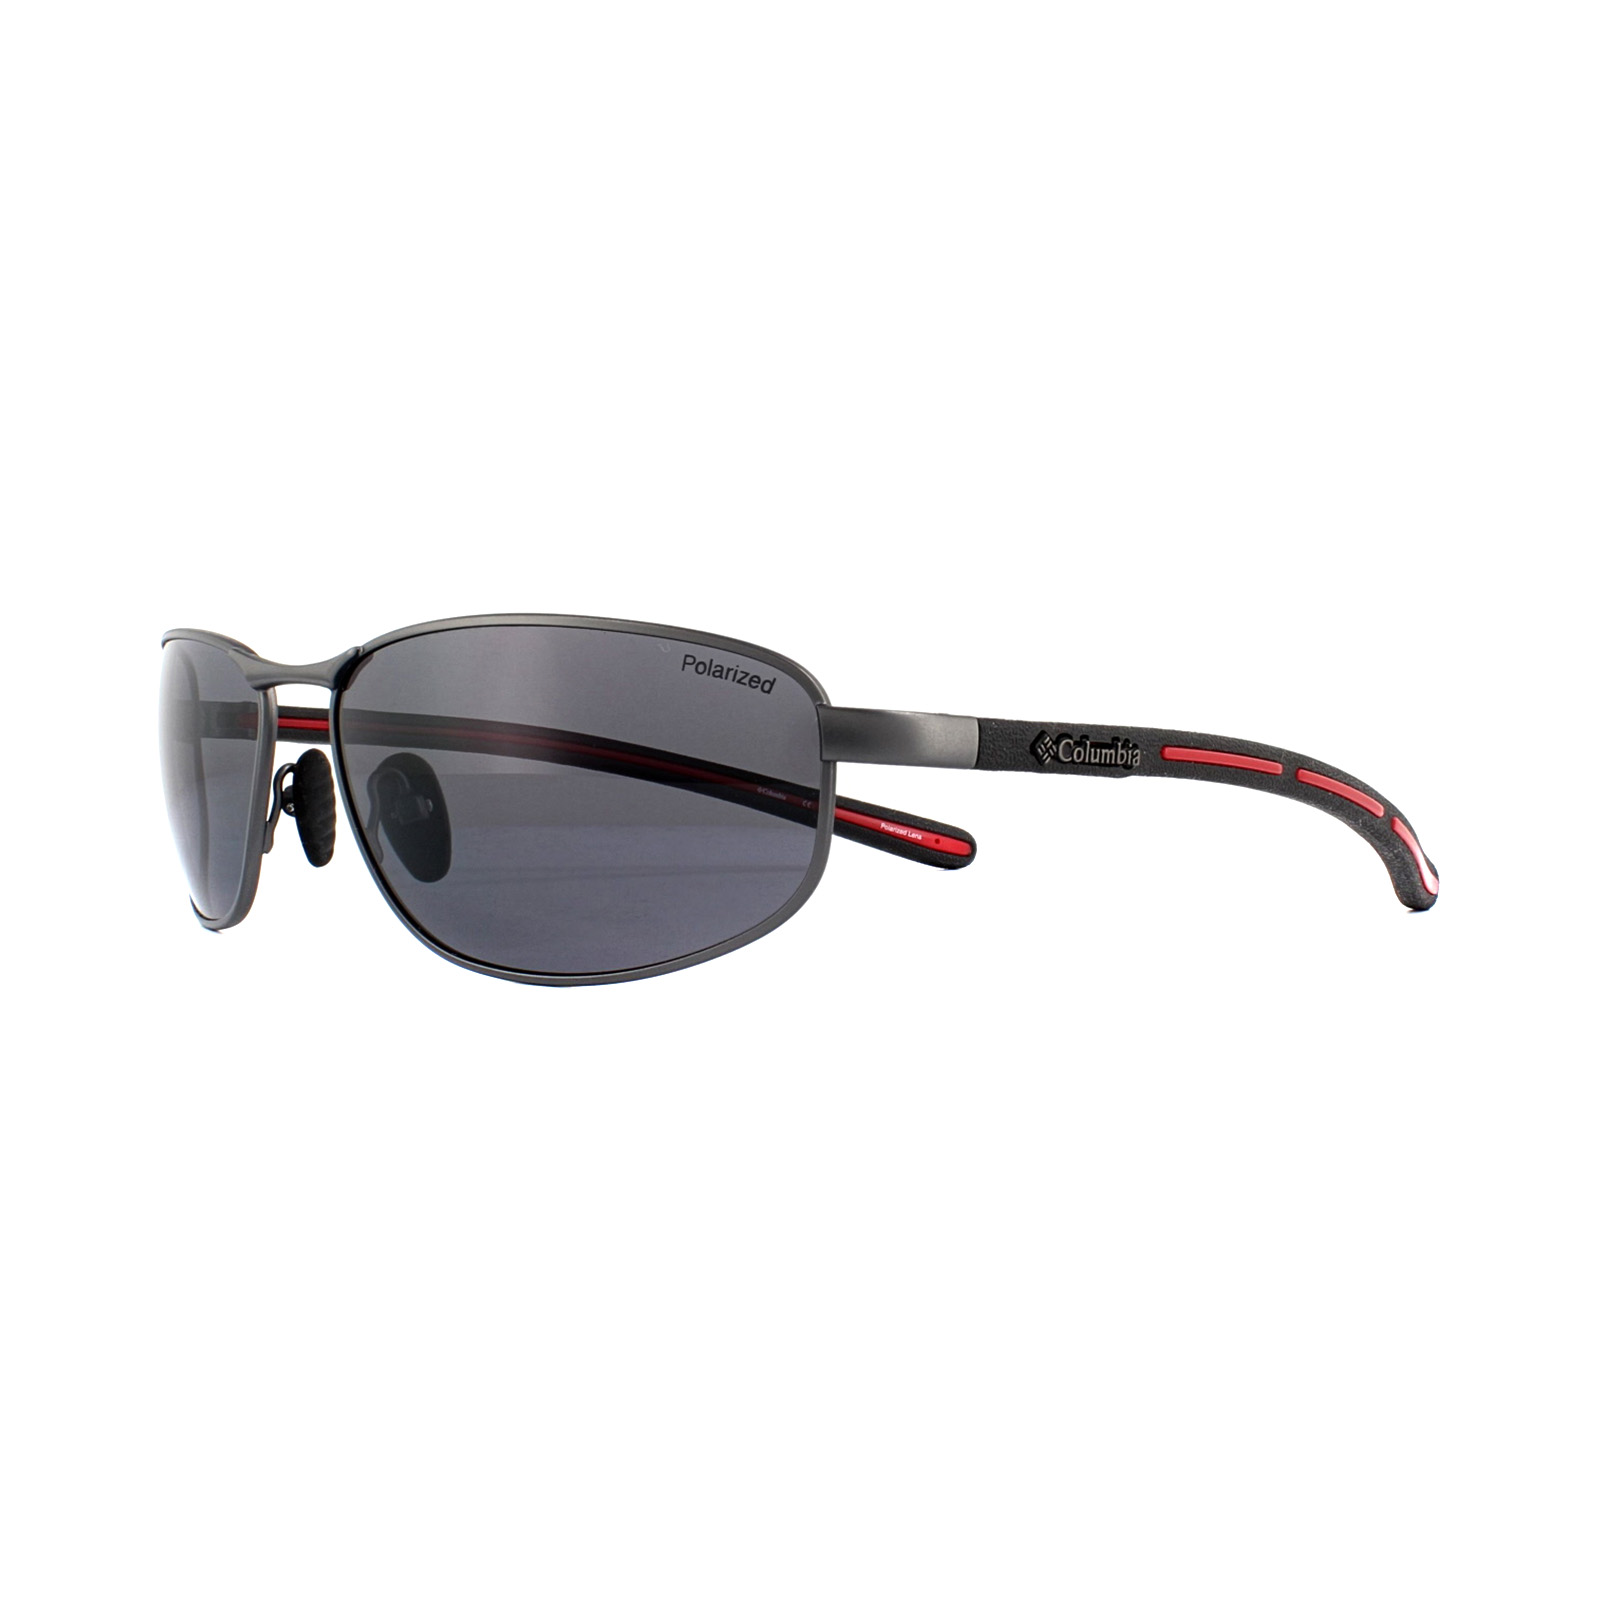 2ff15c21f9 Sentinel Columbia Sunglasses Ripsaw 100 C02 Gunmetal Black Grey Gradient  Polarized